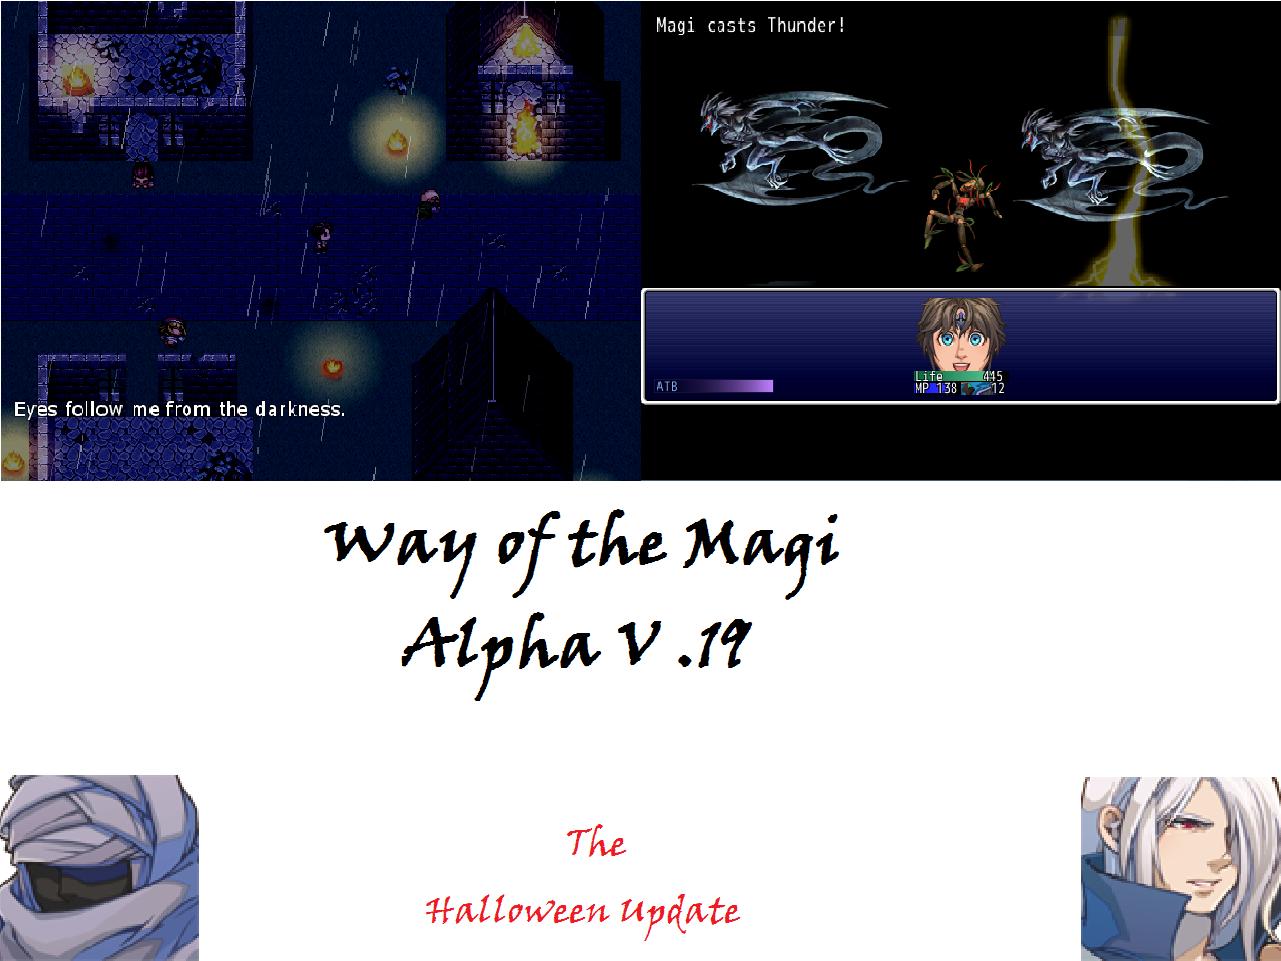 WotM Alpha V 19 Halloween